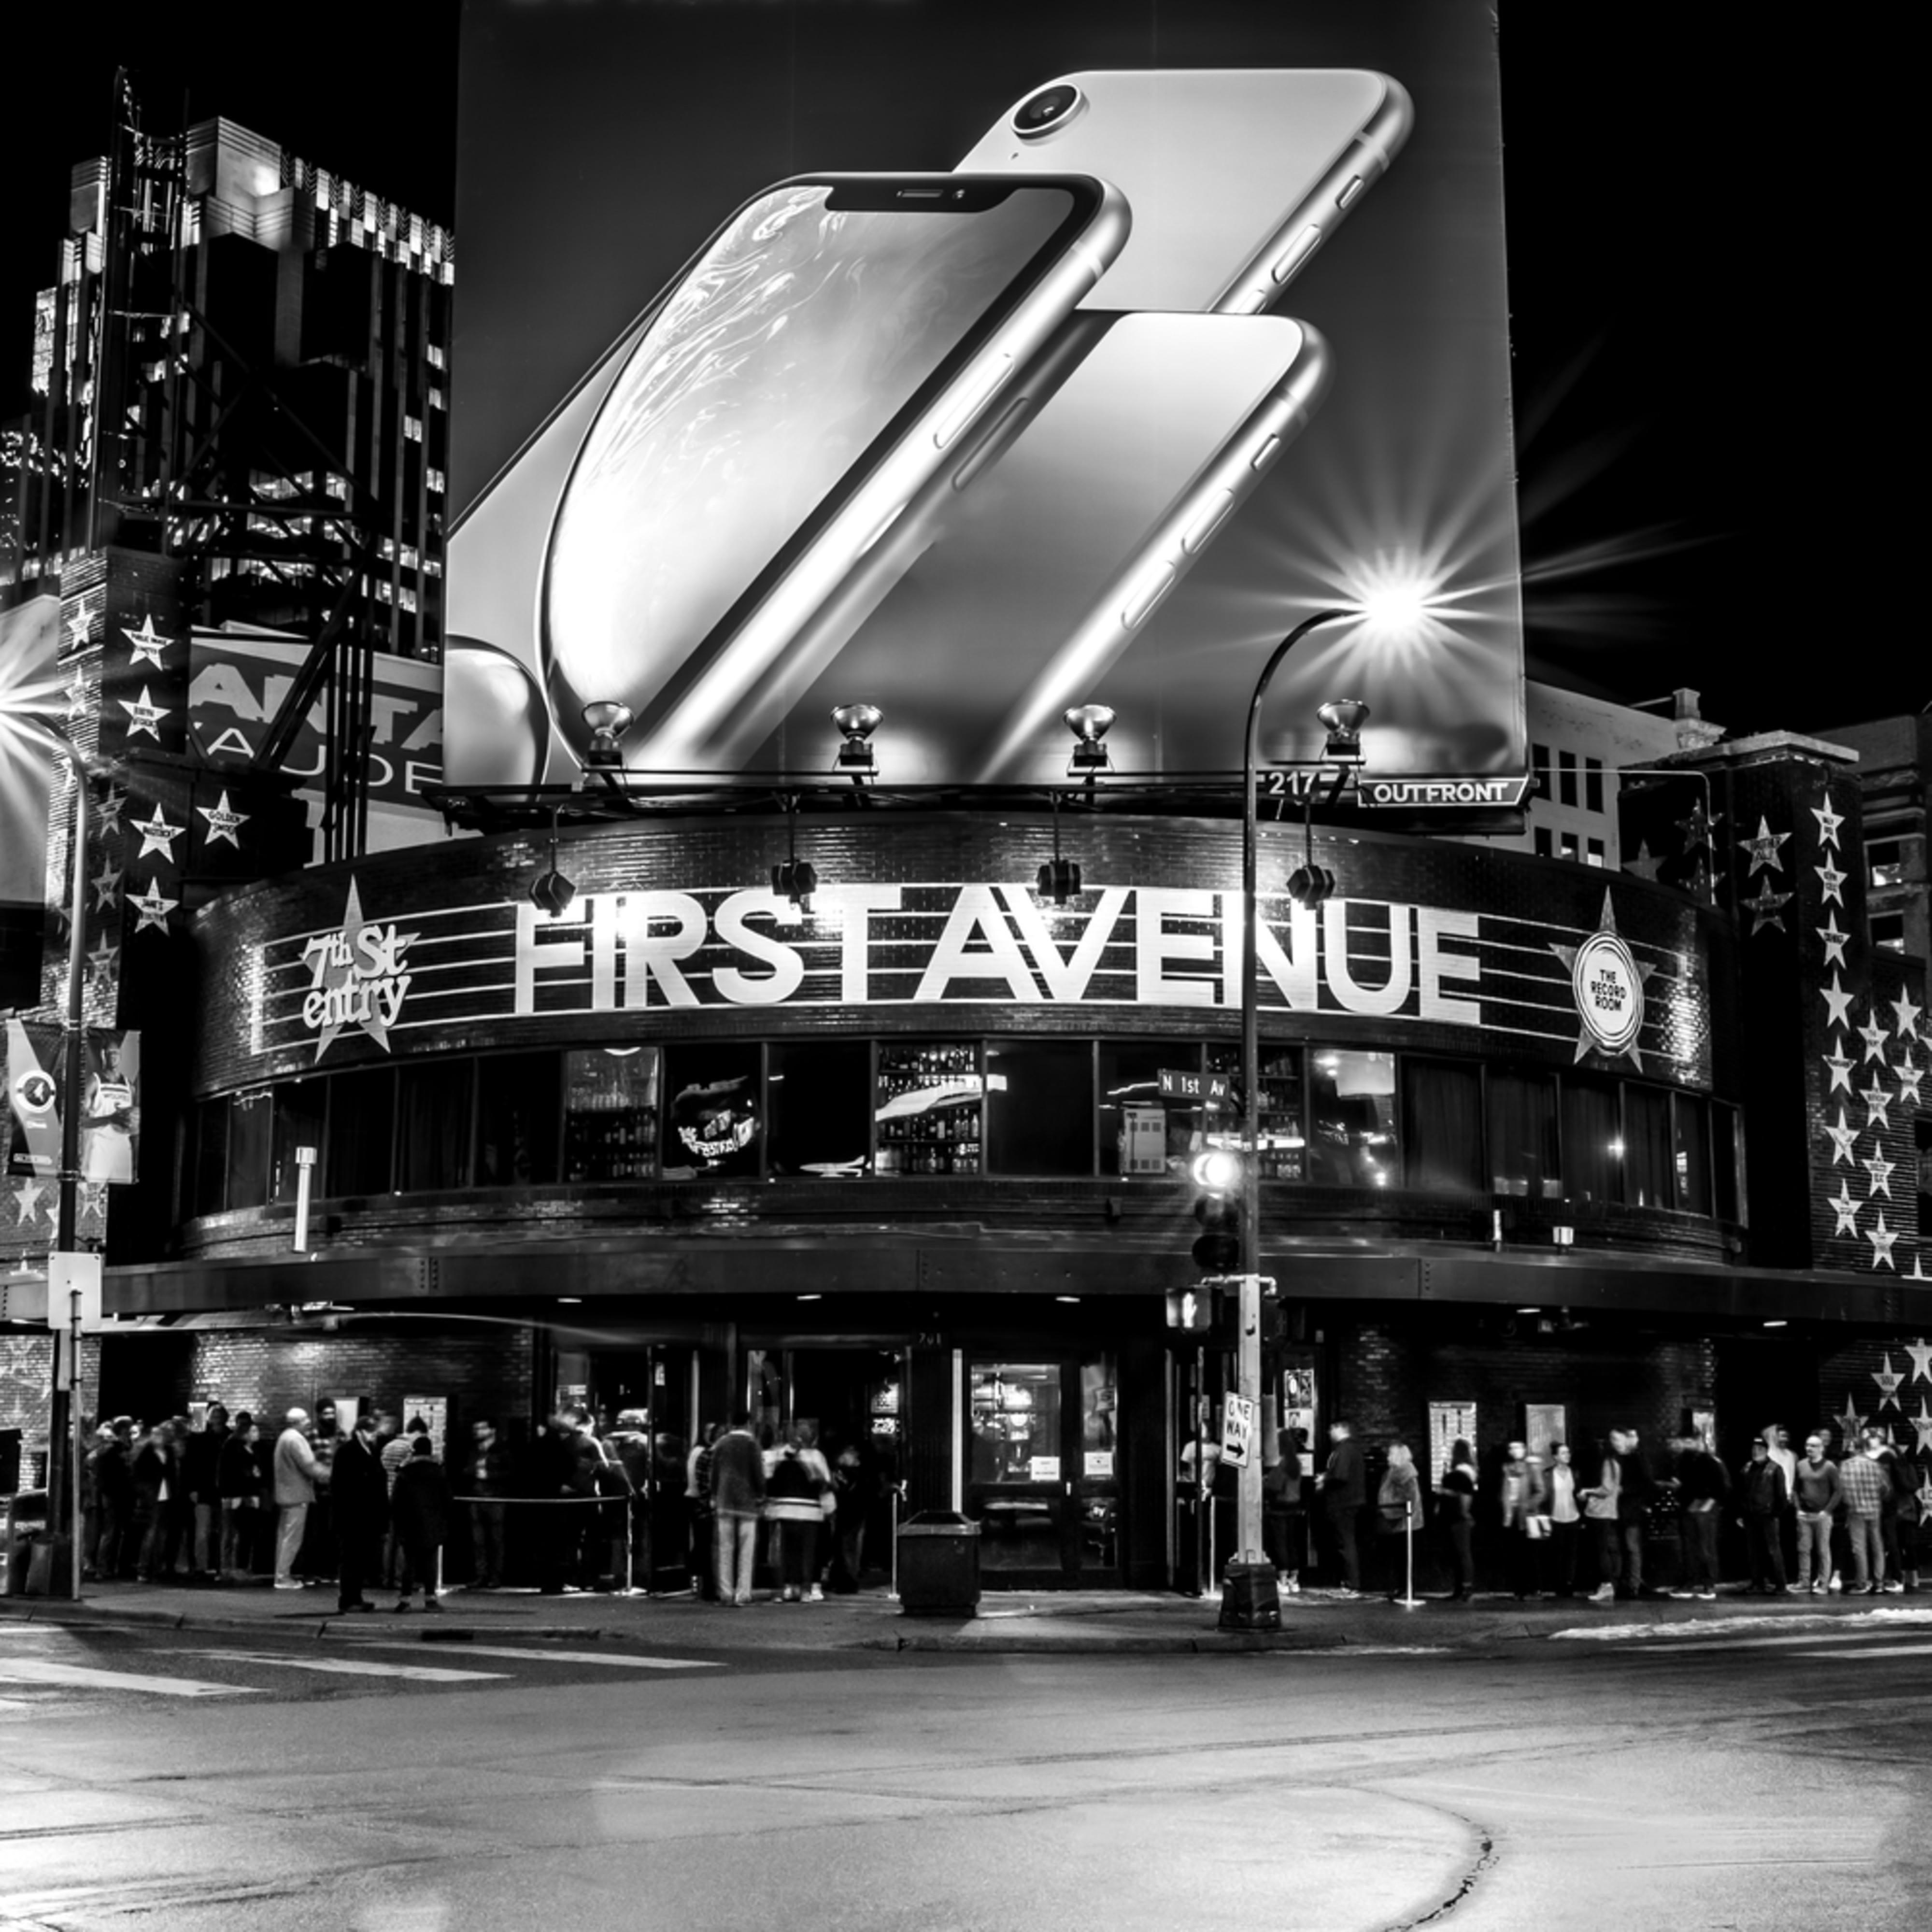 First avenue 4 pobdza